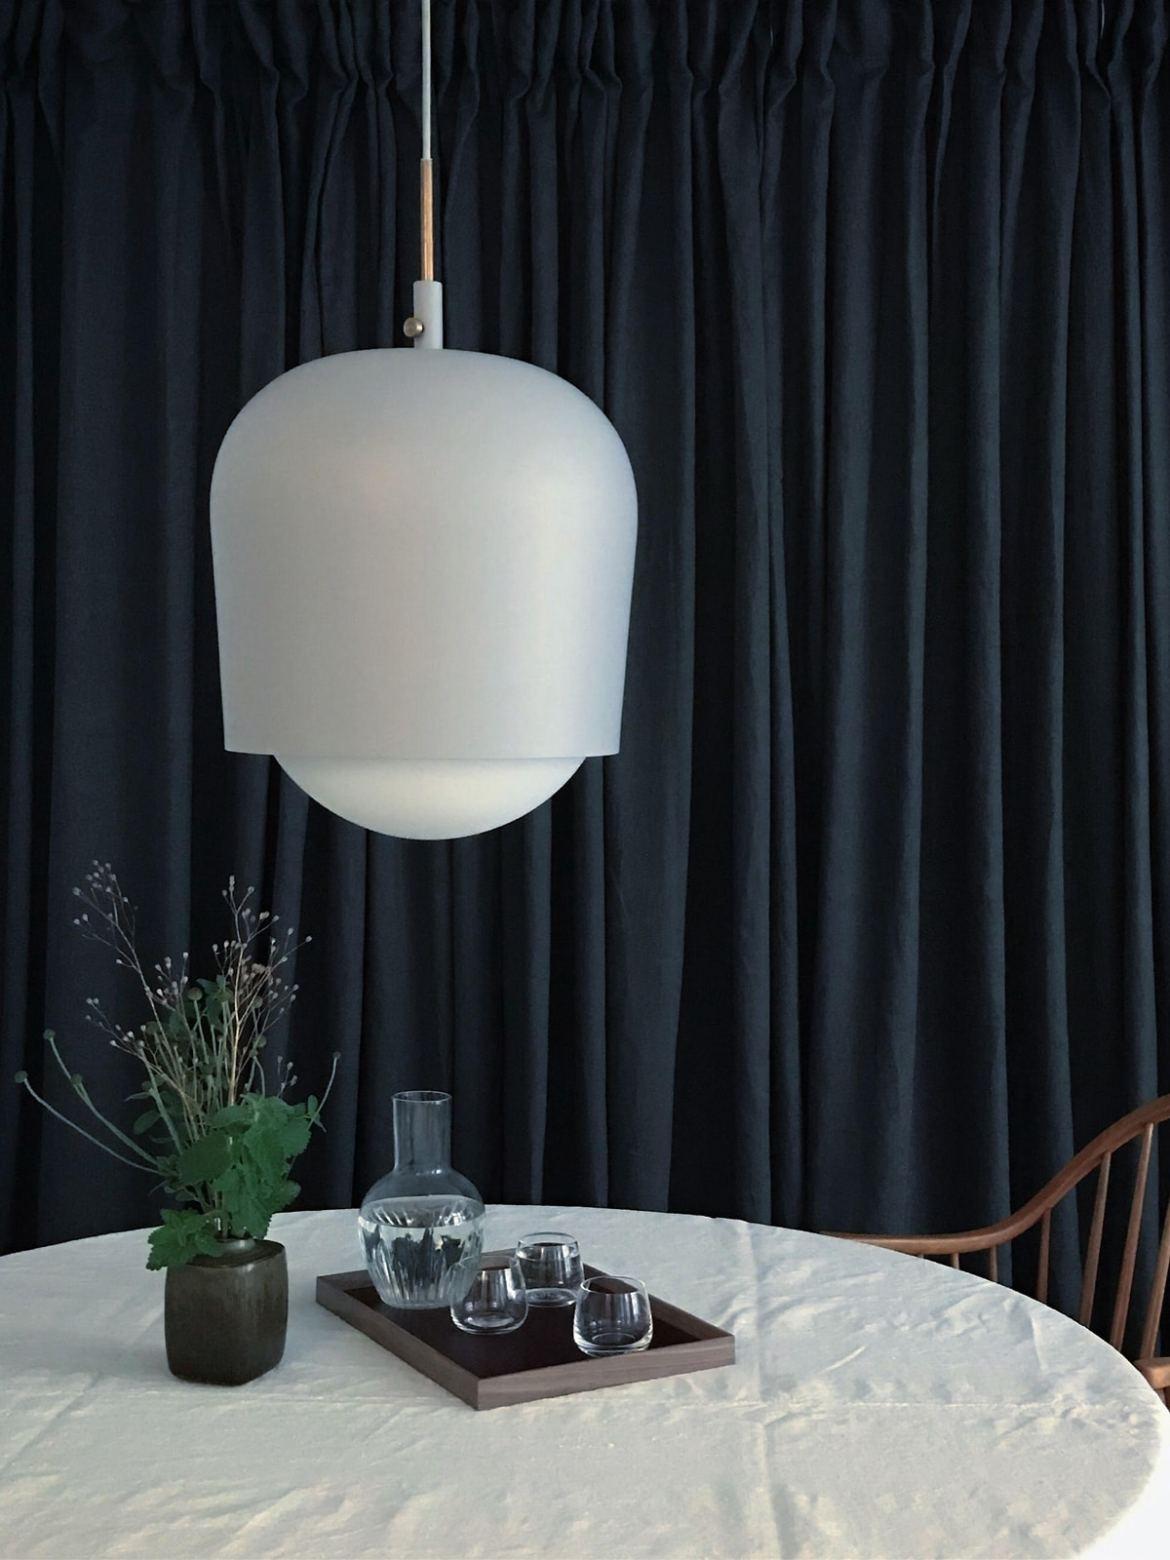 DesignOrt Blog: Die Designwelt von MUNK collective Pendel Lampe Blind Lamp manuel dimmbar munk collective